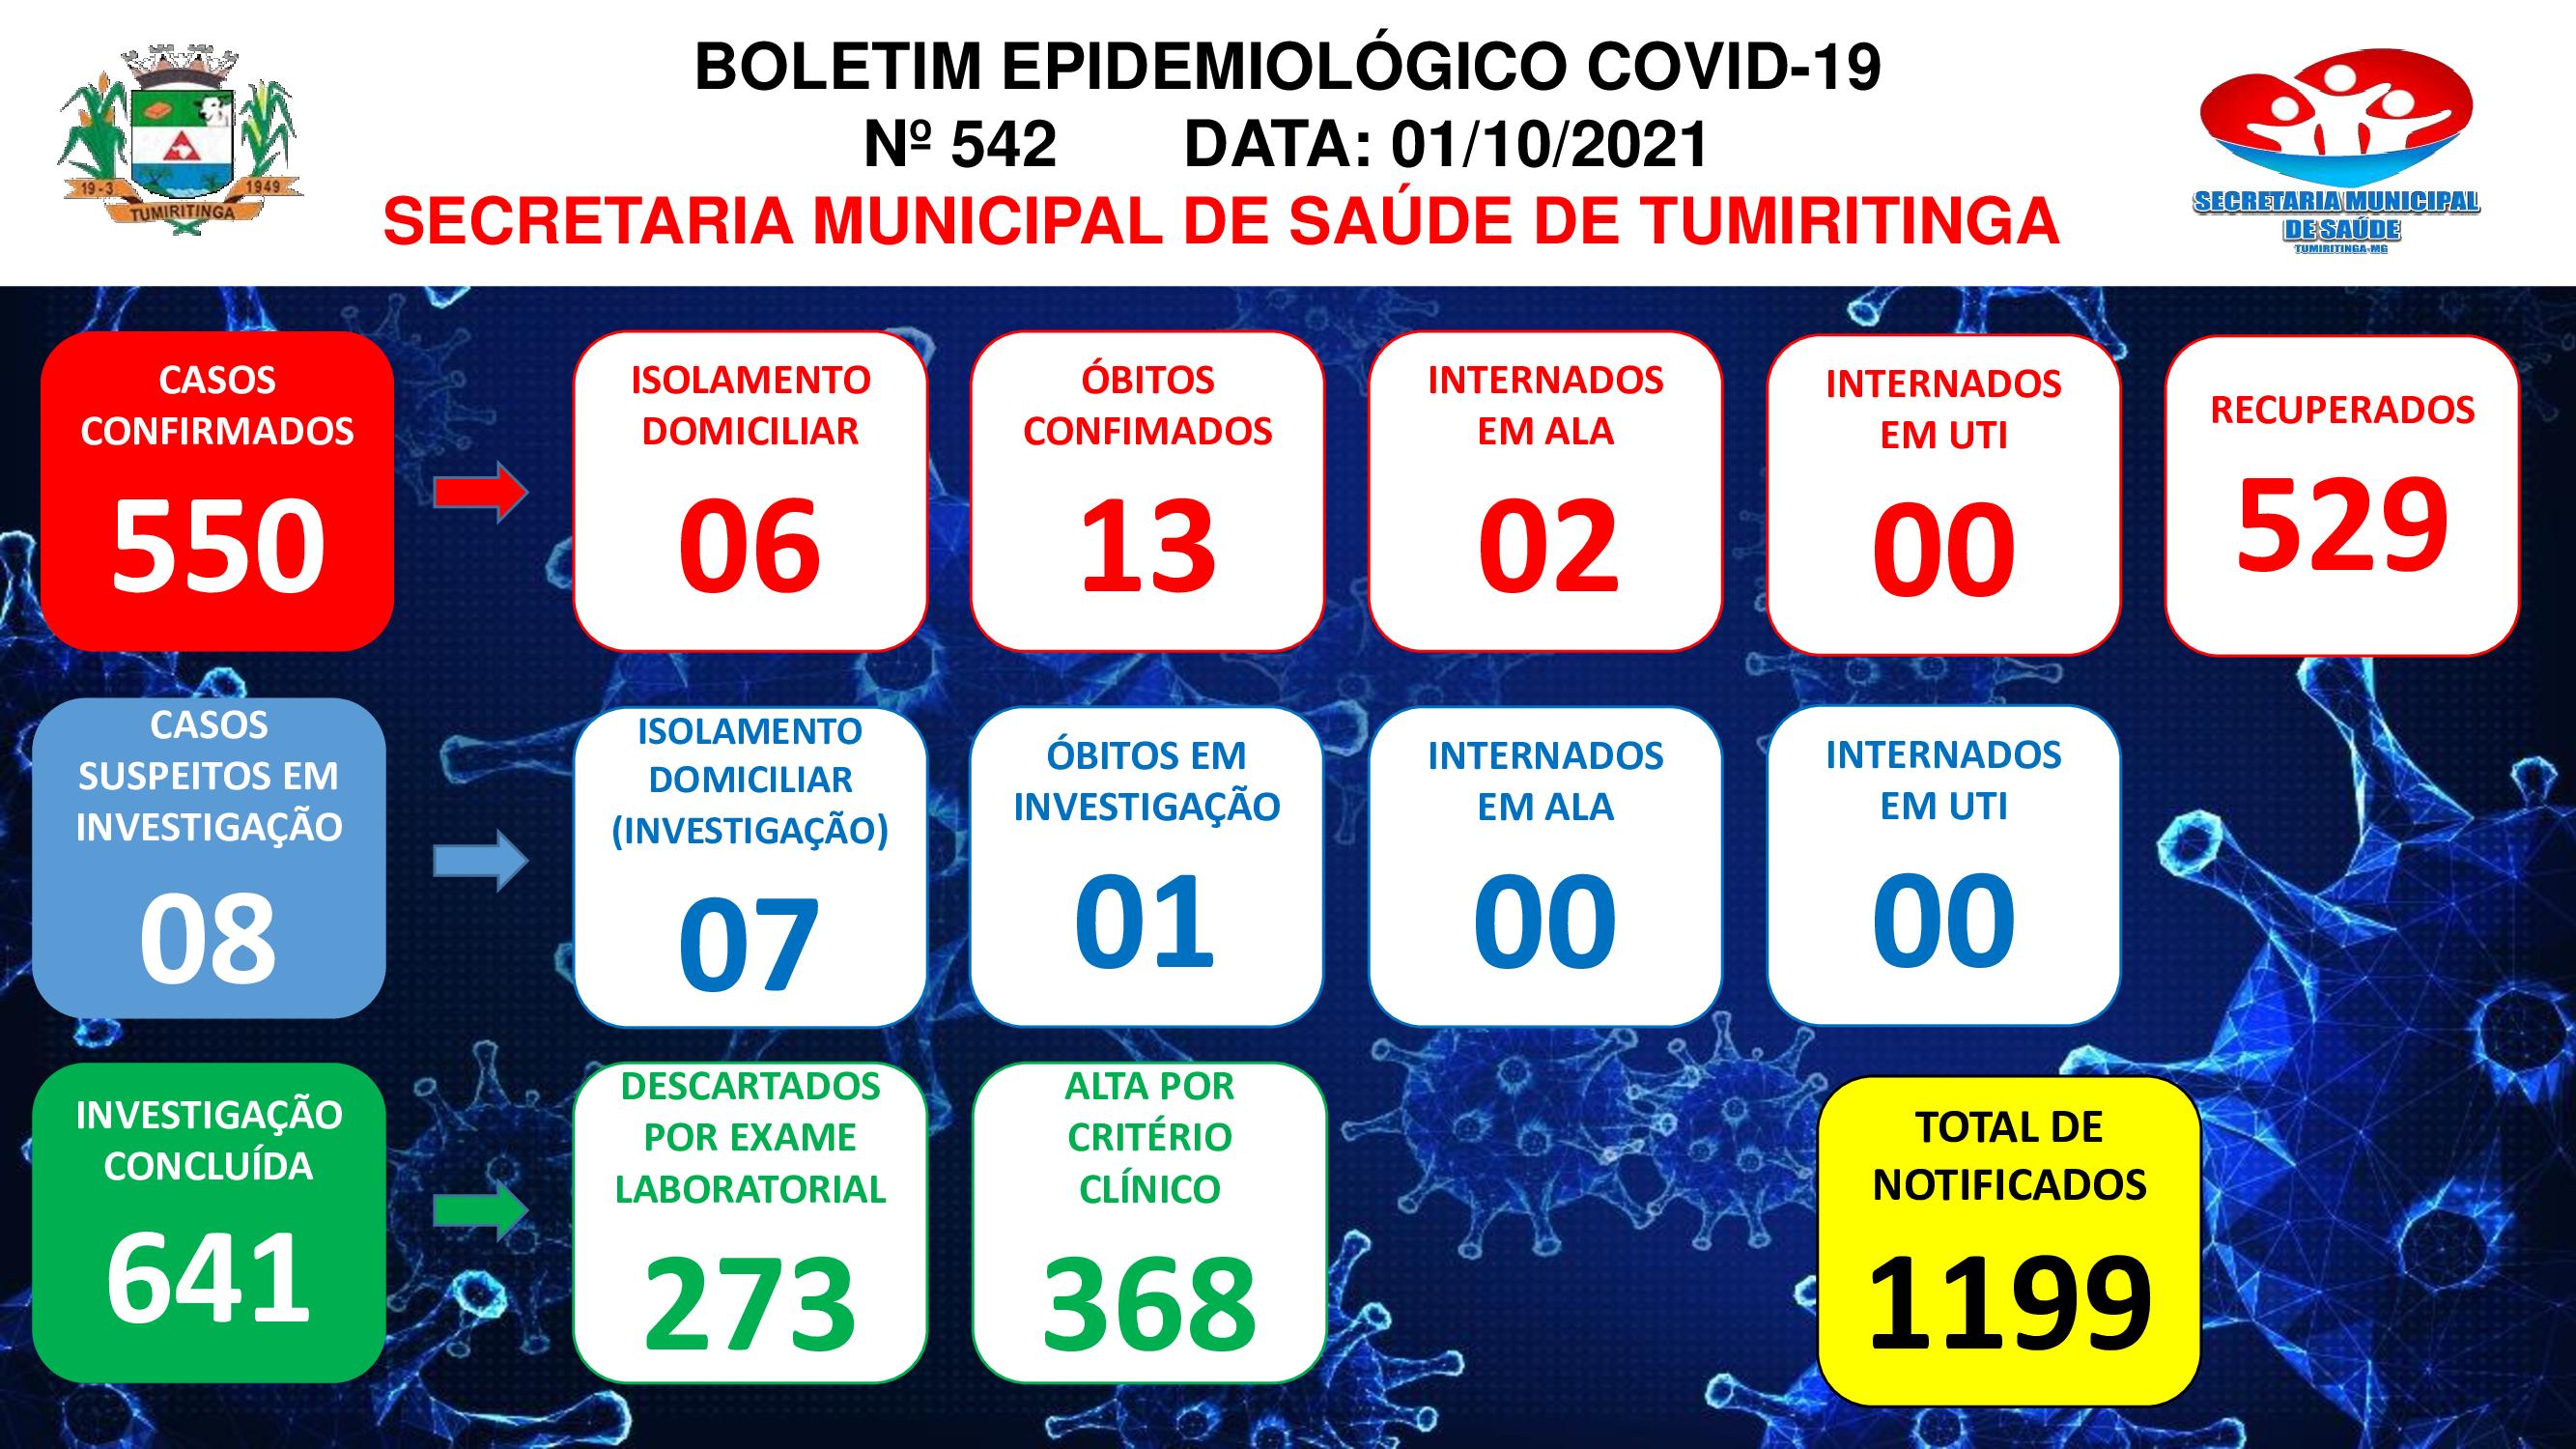 BOLETIM EPIDEMIOLÓGICO CORONAVÍRUS N° 542 - 01/10/2021